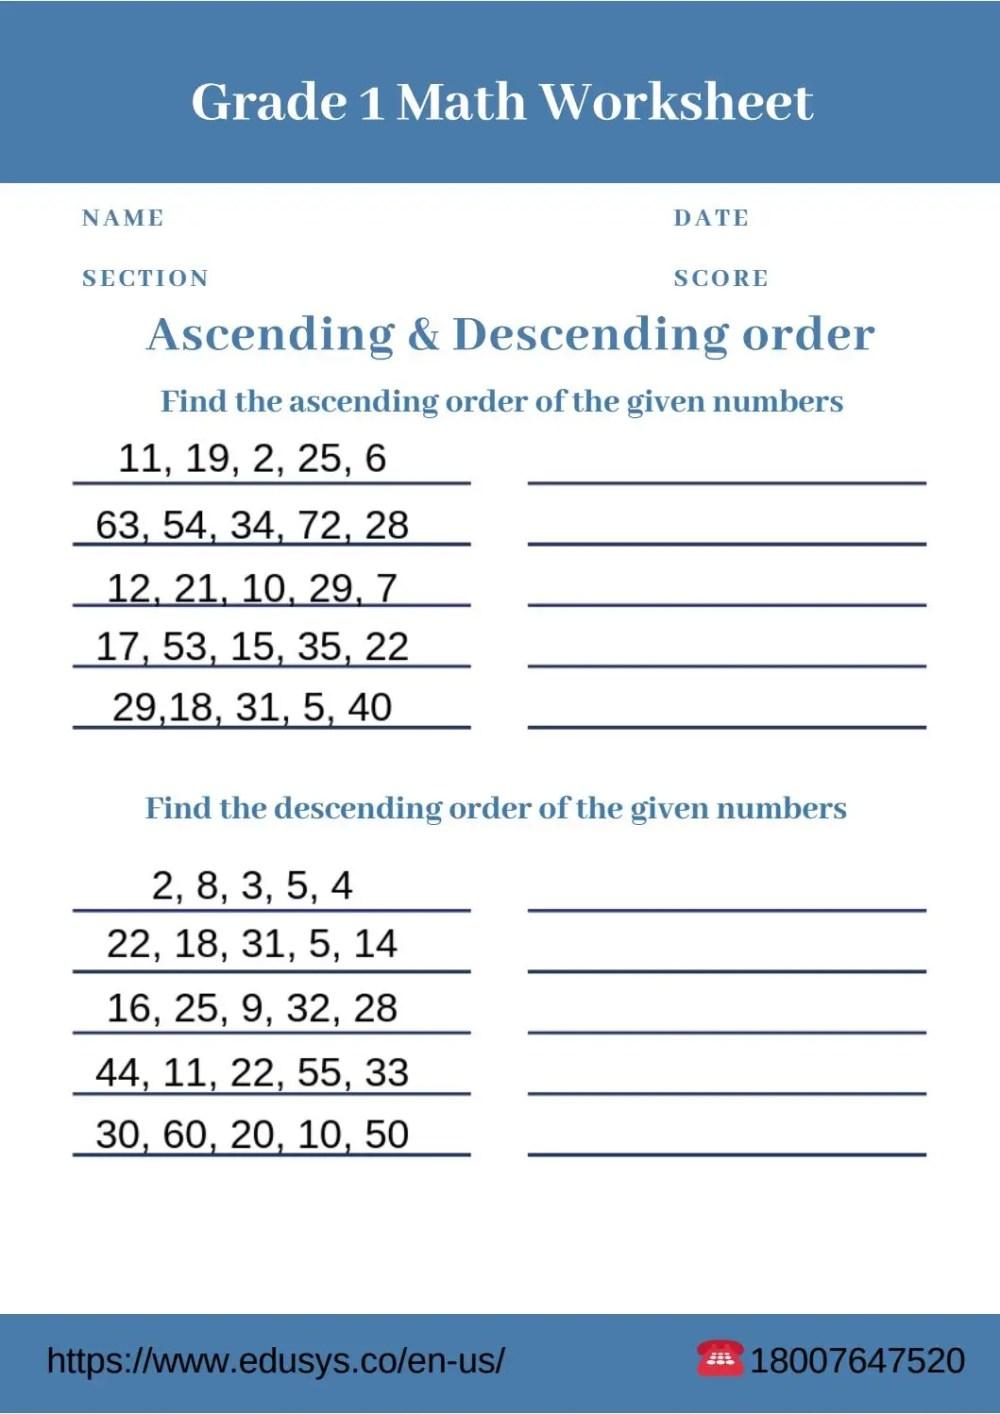 medium resolution of 1st grade math worksheet free pdf printable by nithya - issuu